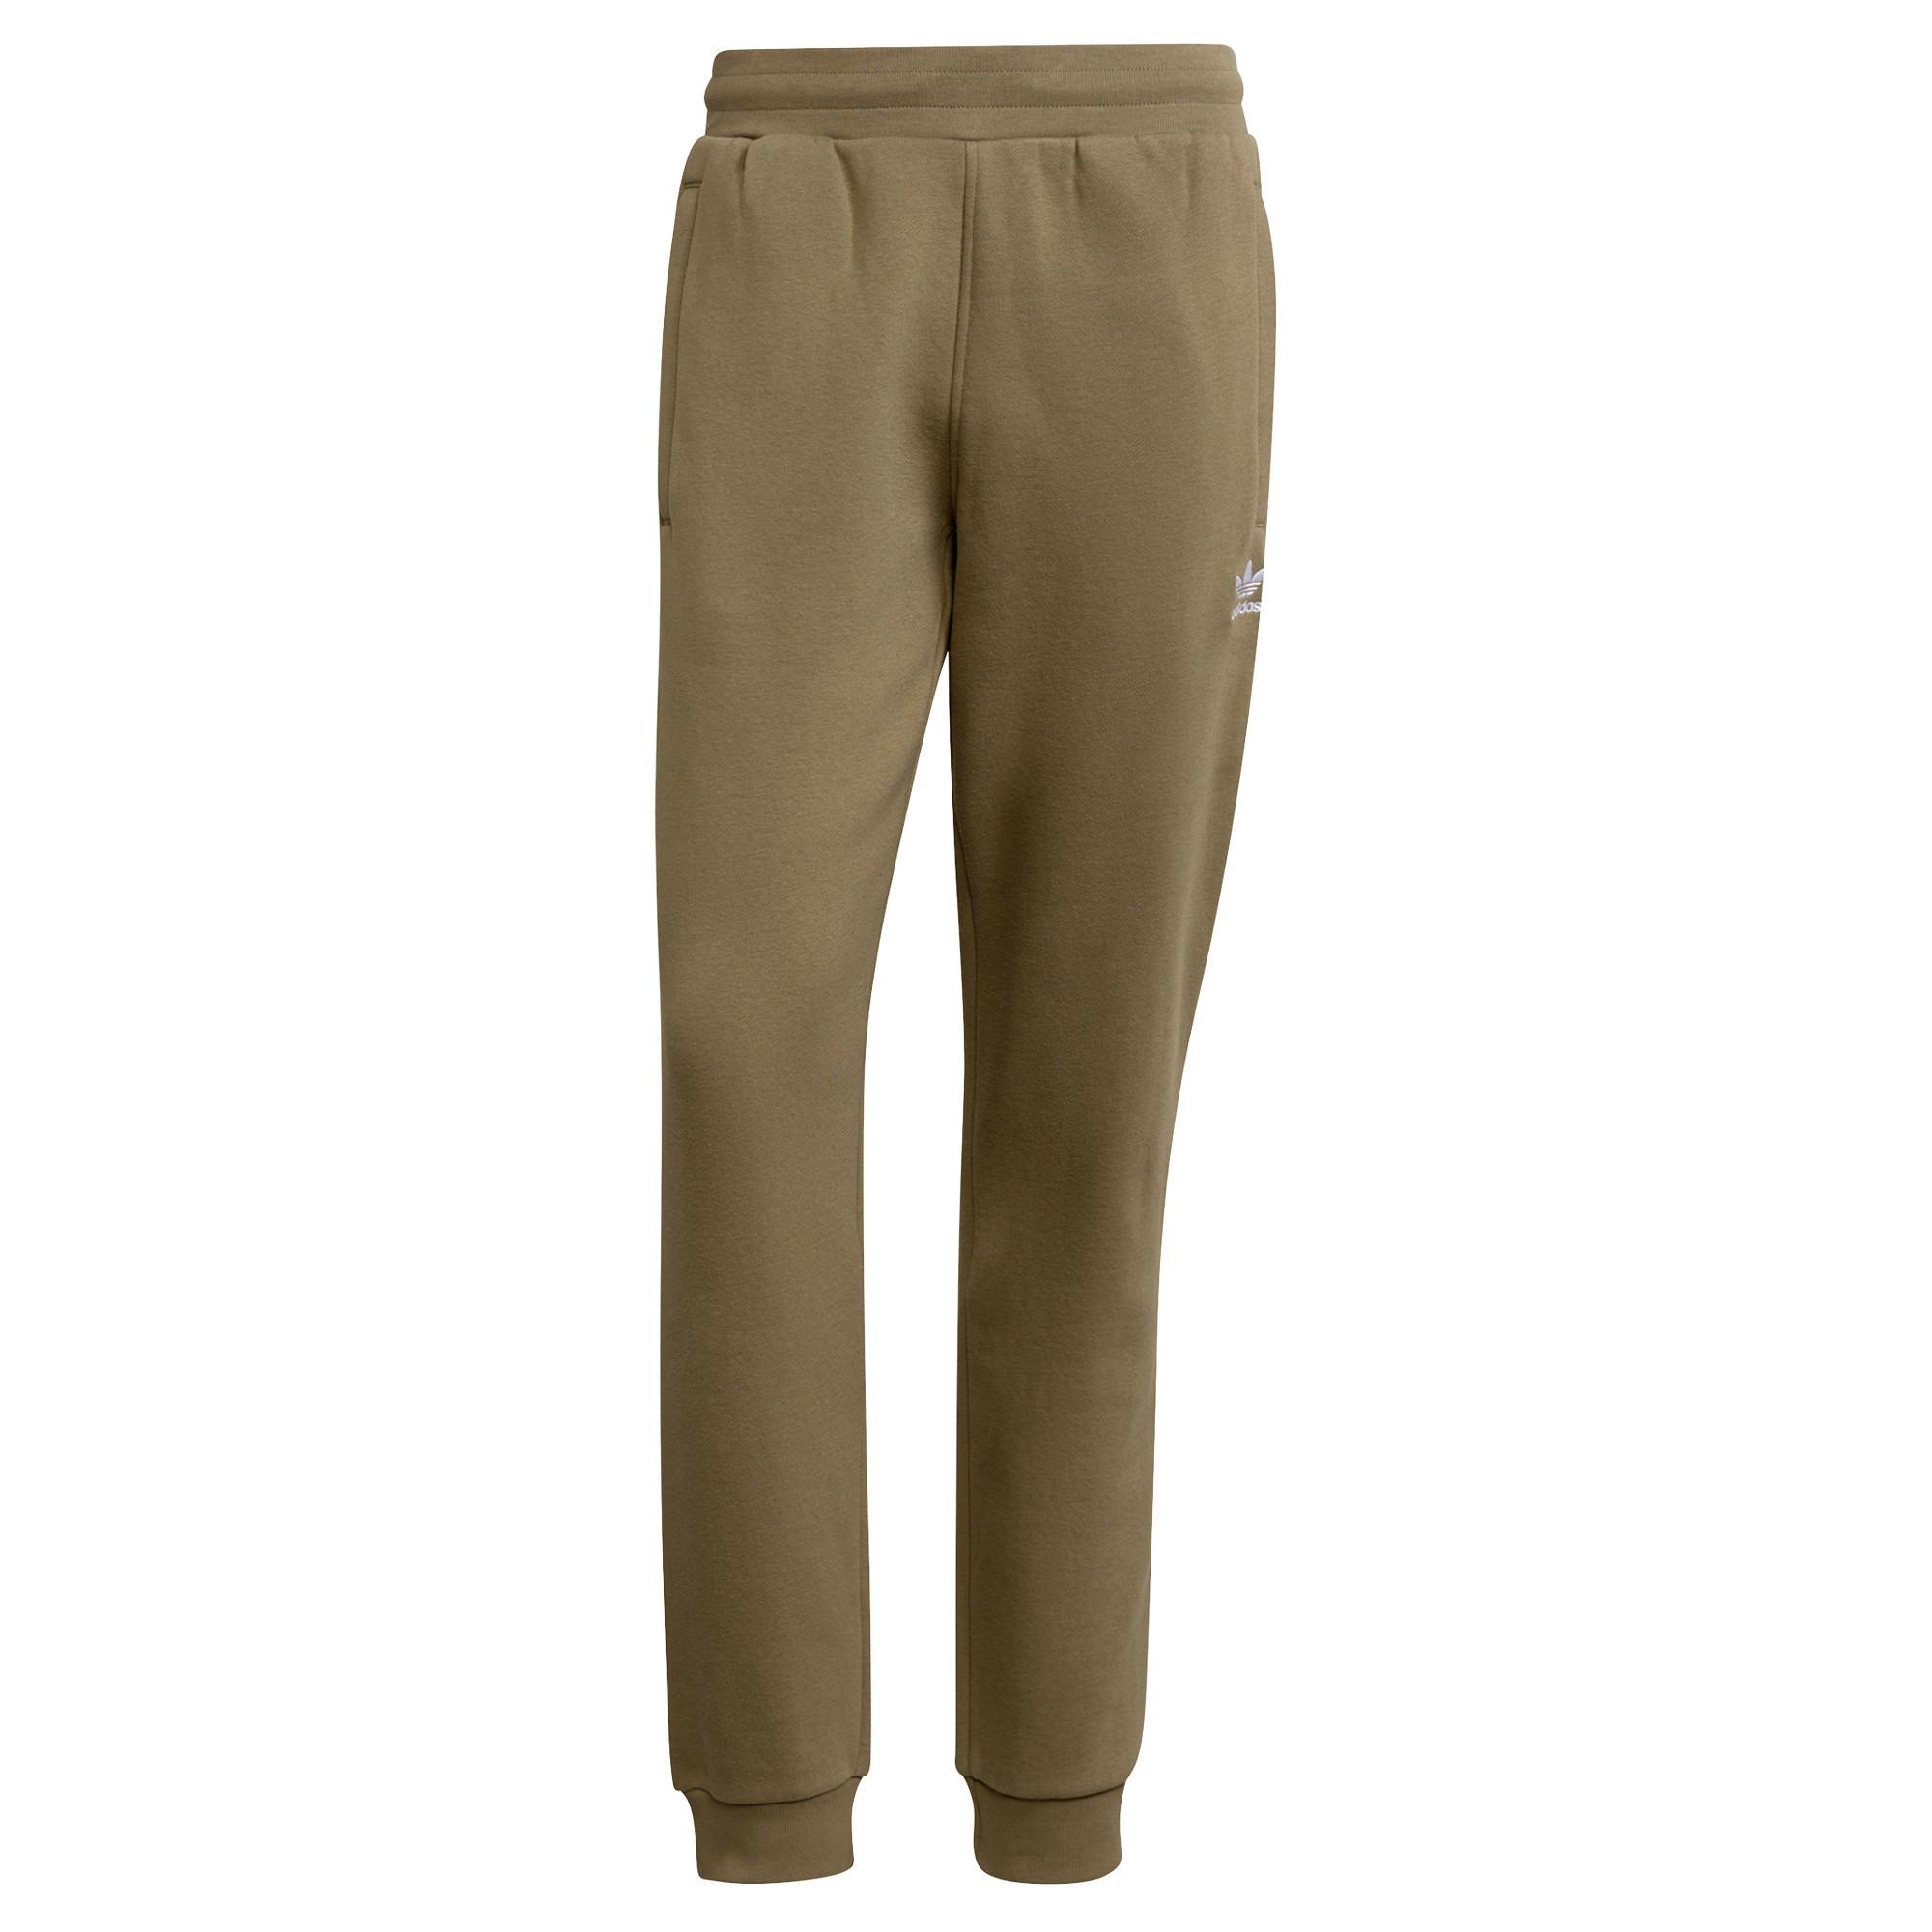 Pantaloni adicolor Essentials Trefoil, Verde, large image number 0